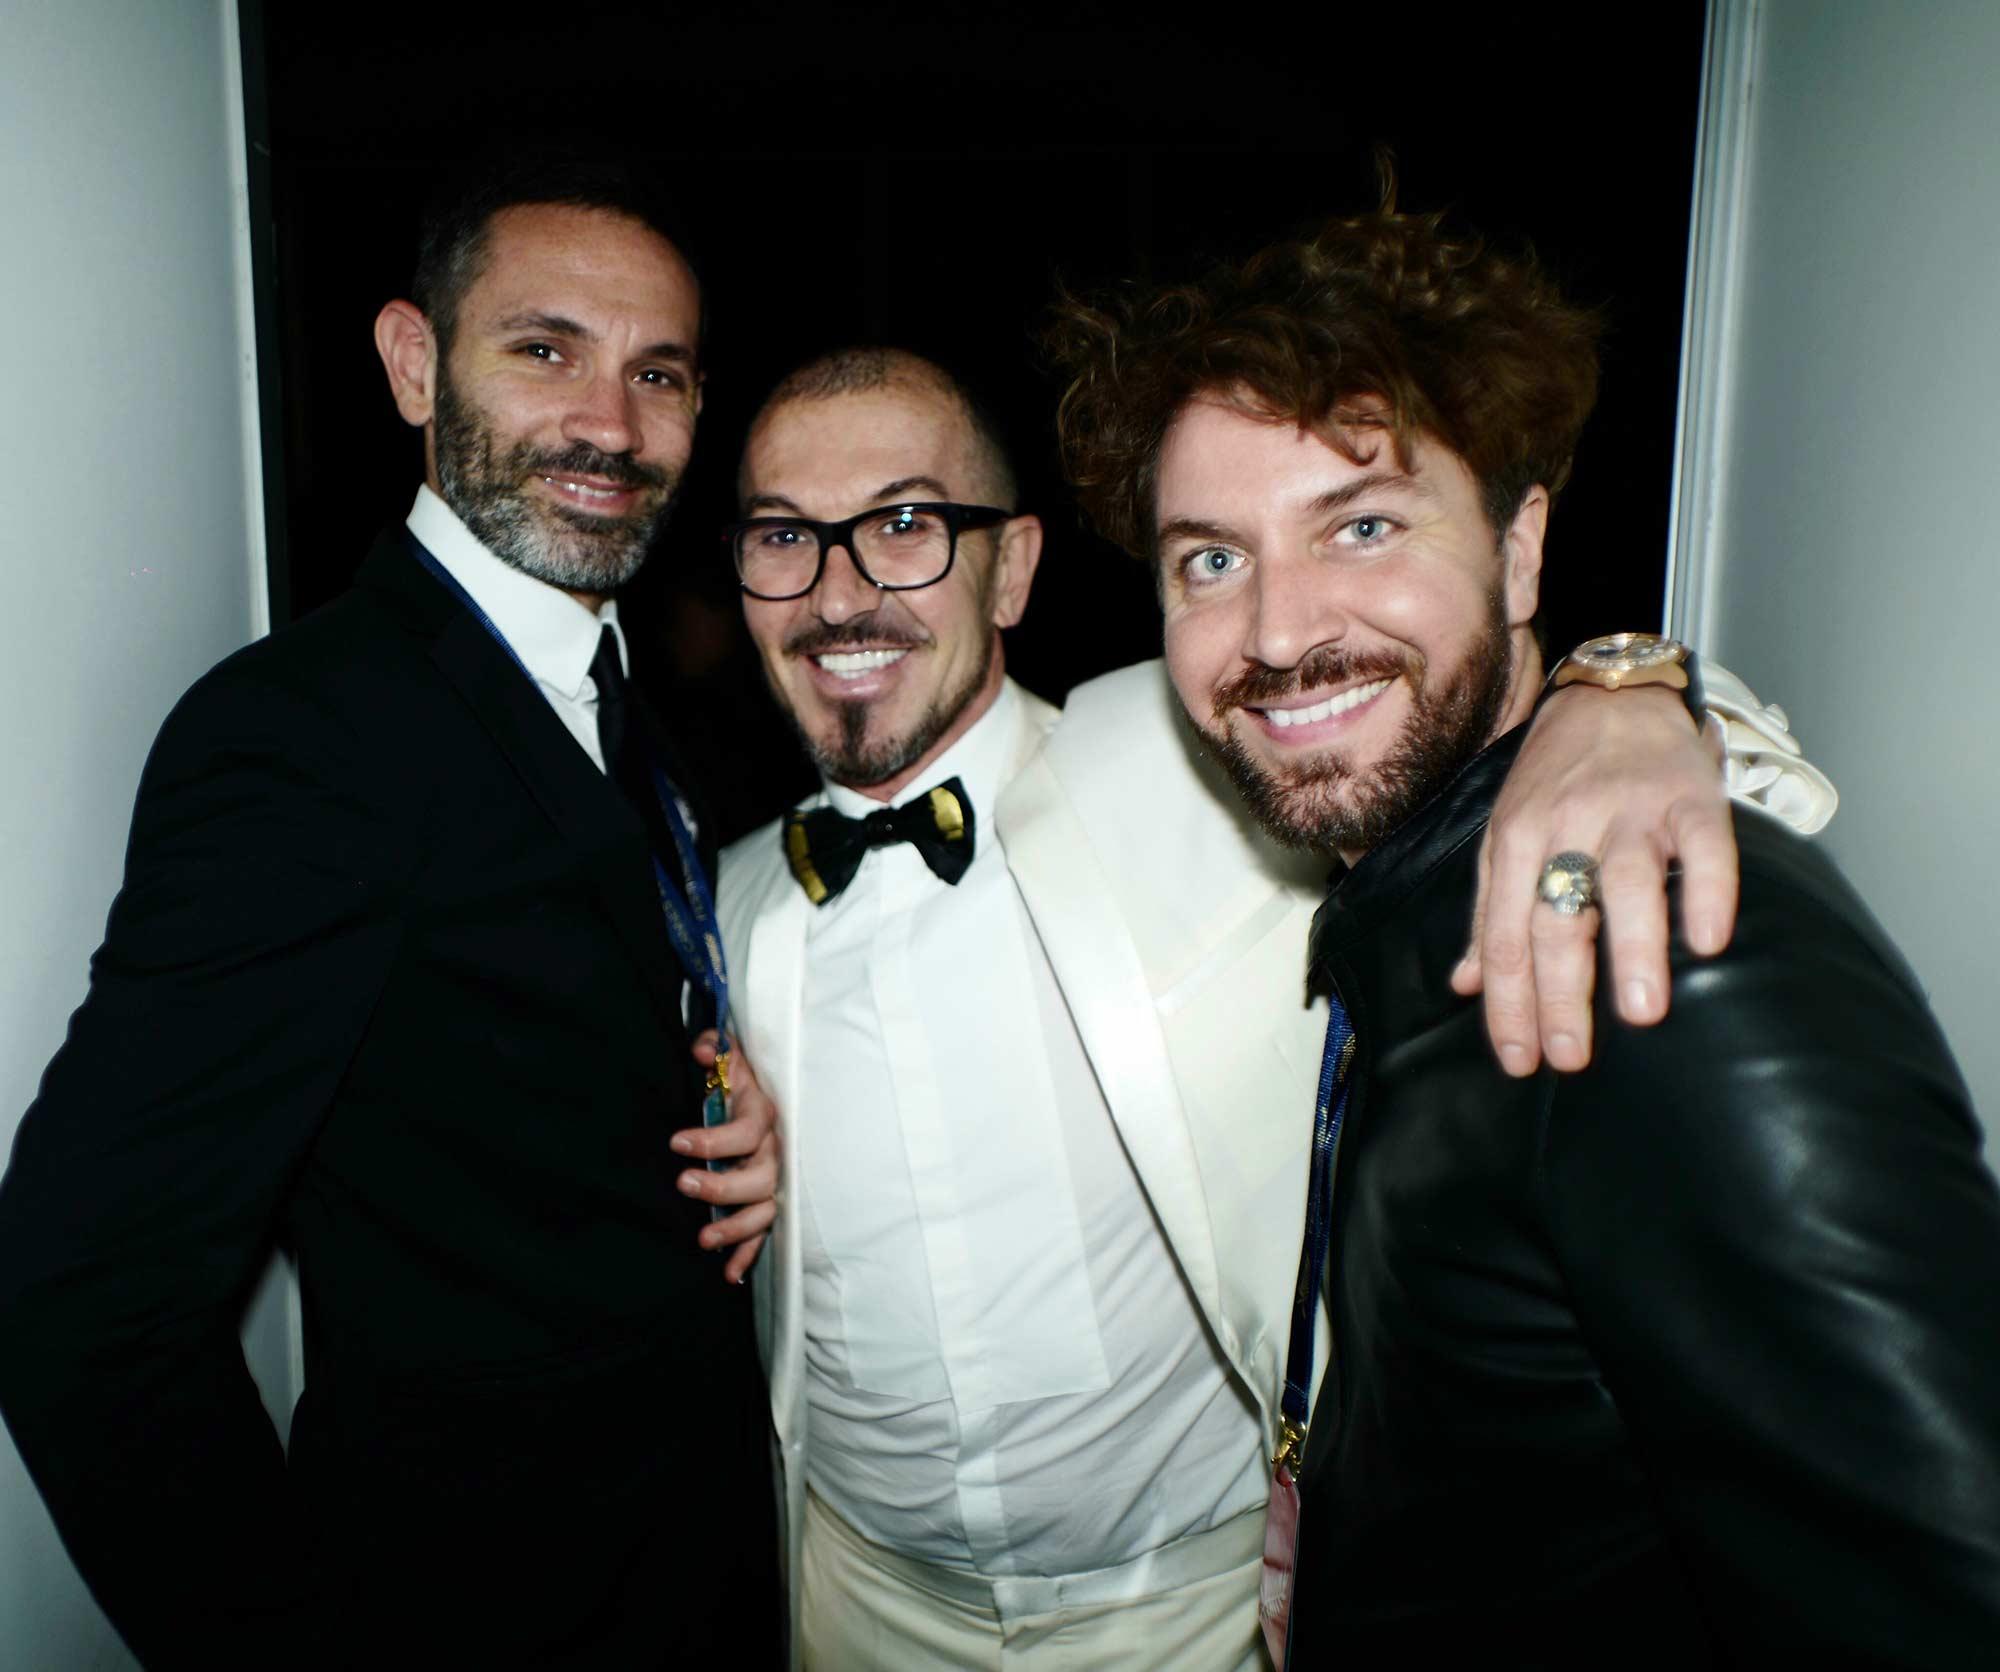 Cannes 2017 - Evento Space Chopard - Riccardo Monteleone, Massimo Serini, Samuele Miccoli